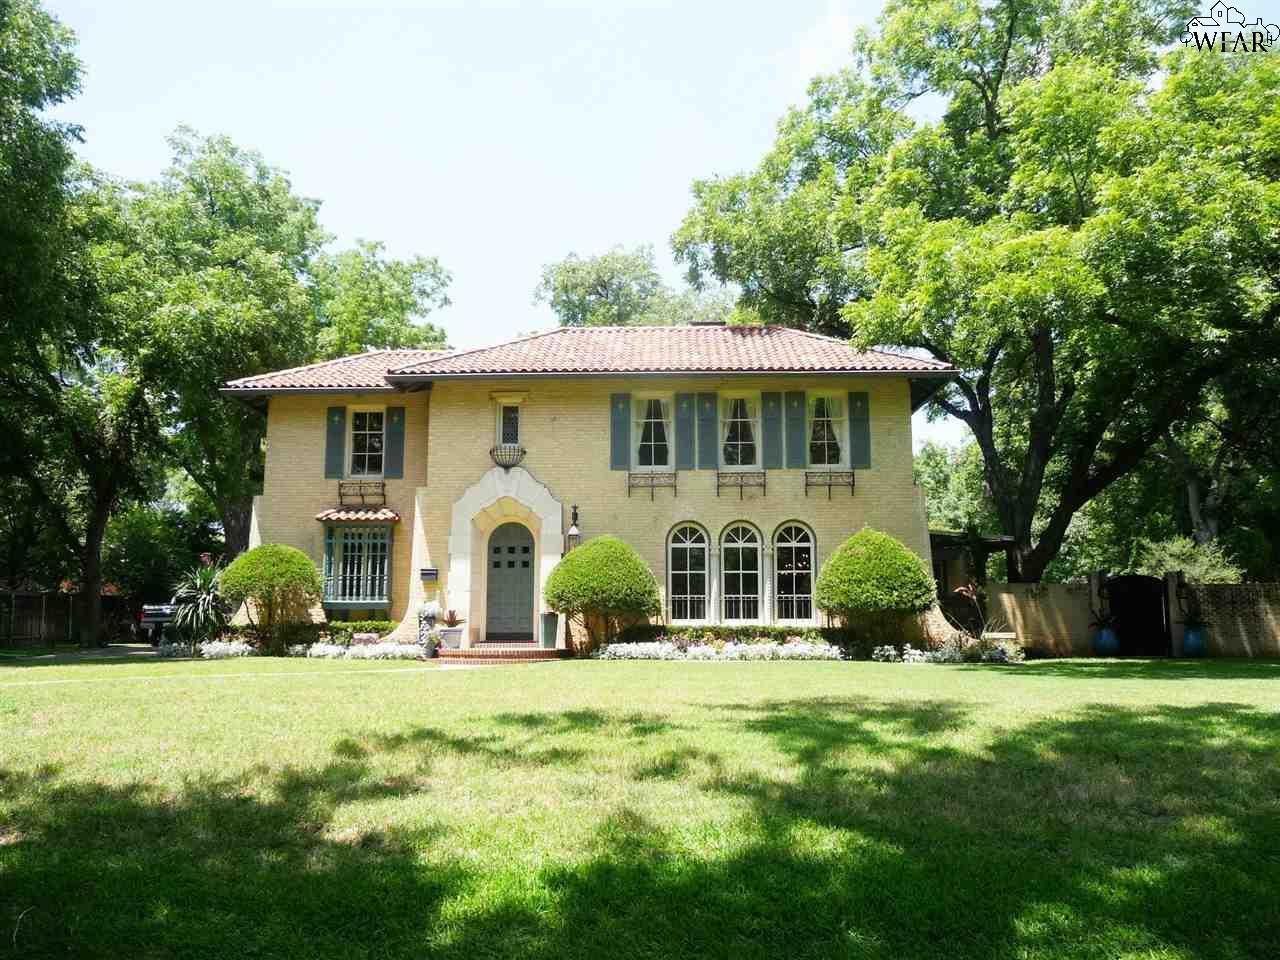 Wichita falls tx homes listing report joan riddles for Home builders wichita falls tx